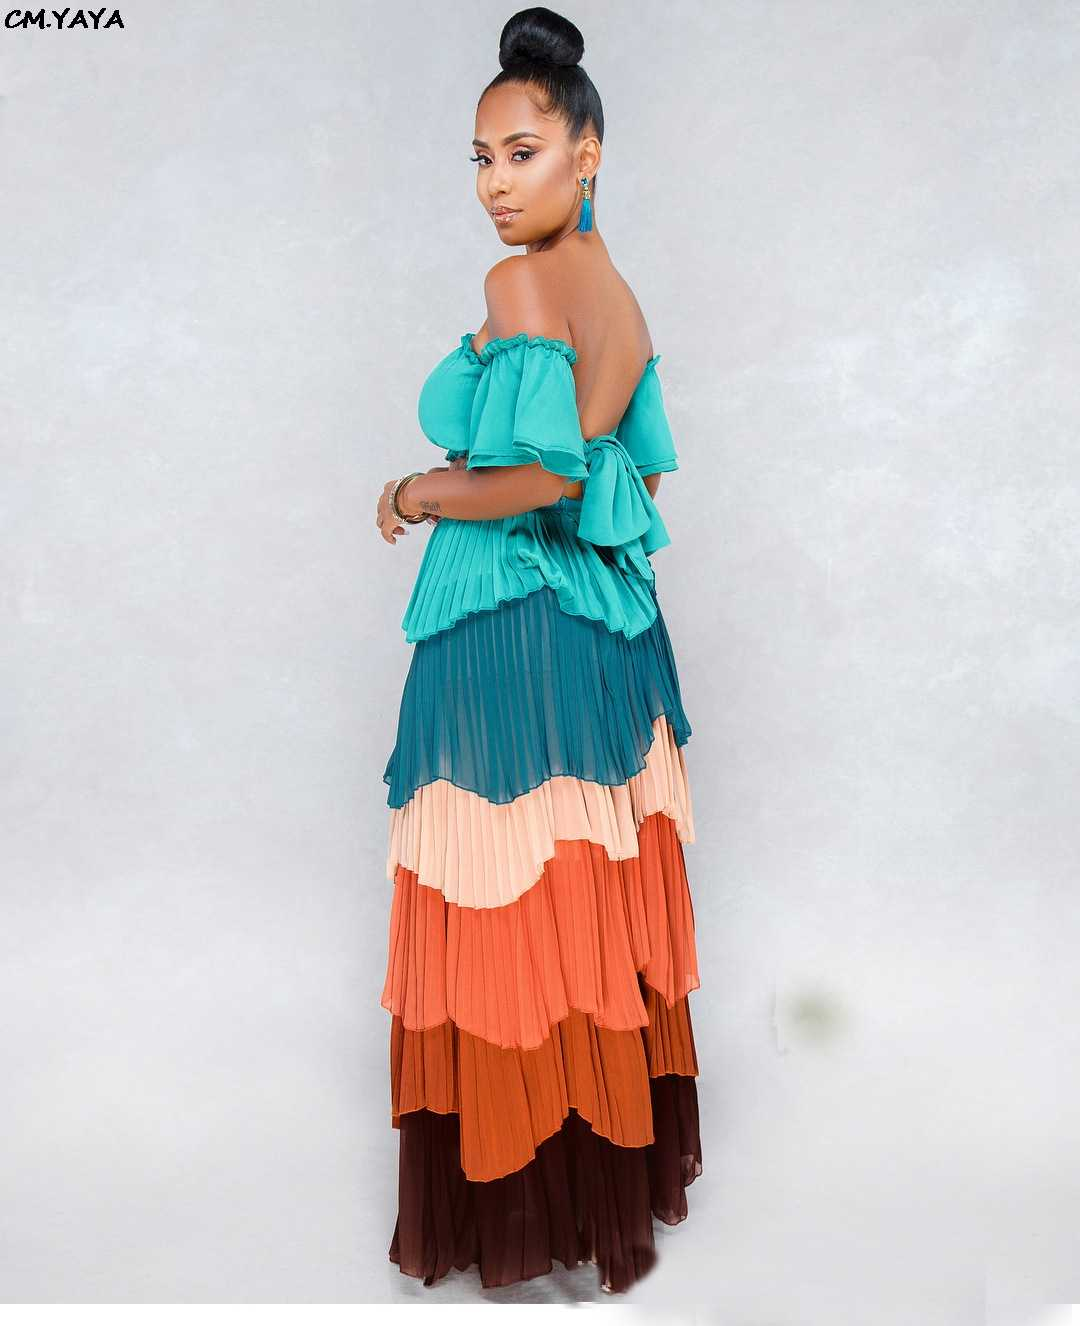 9d4a304493097 2019 women off shoulder tie up crop top cascading ruffles pleated maxi  skirts set 2pcs suit outfit lond dresses 3 color DF0616